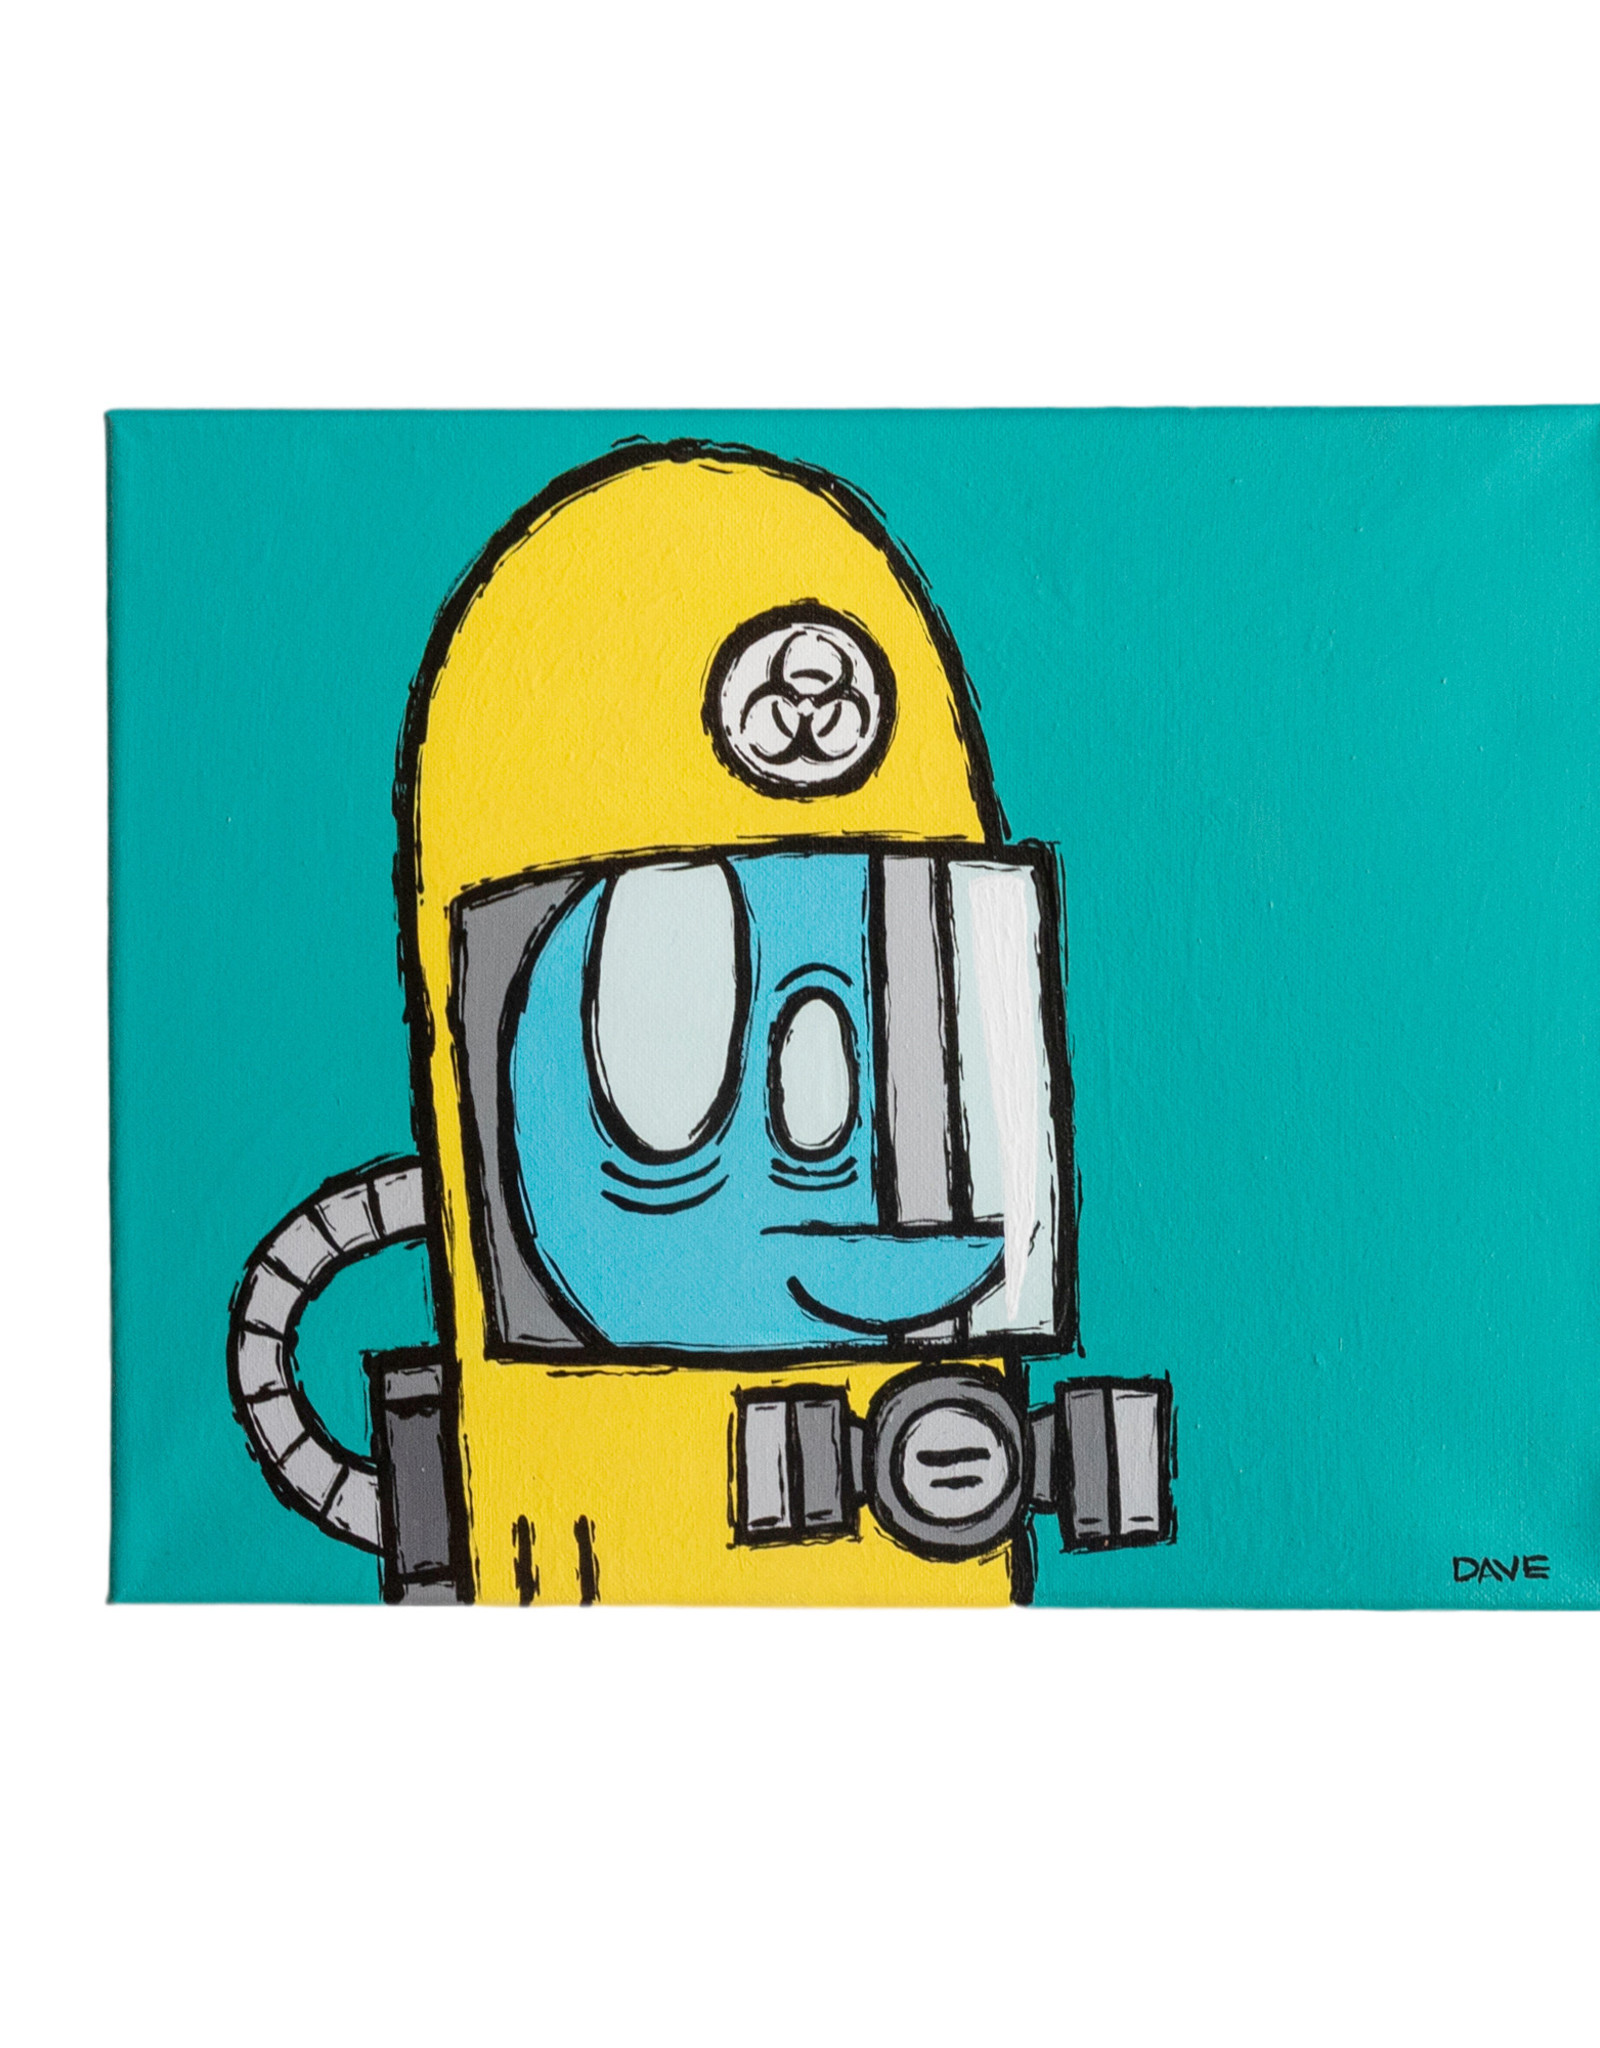 Dave Palmer Dave Palmer Original Artwork Biohazard Yeti 2020 11x14